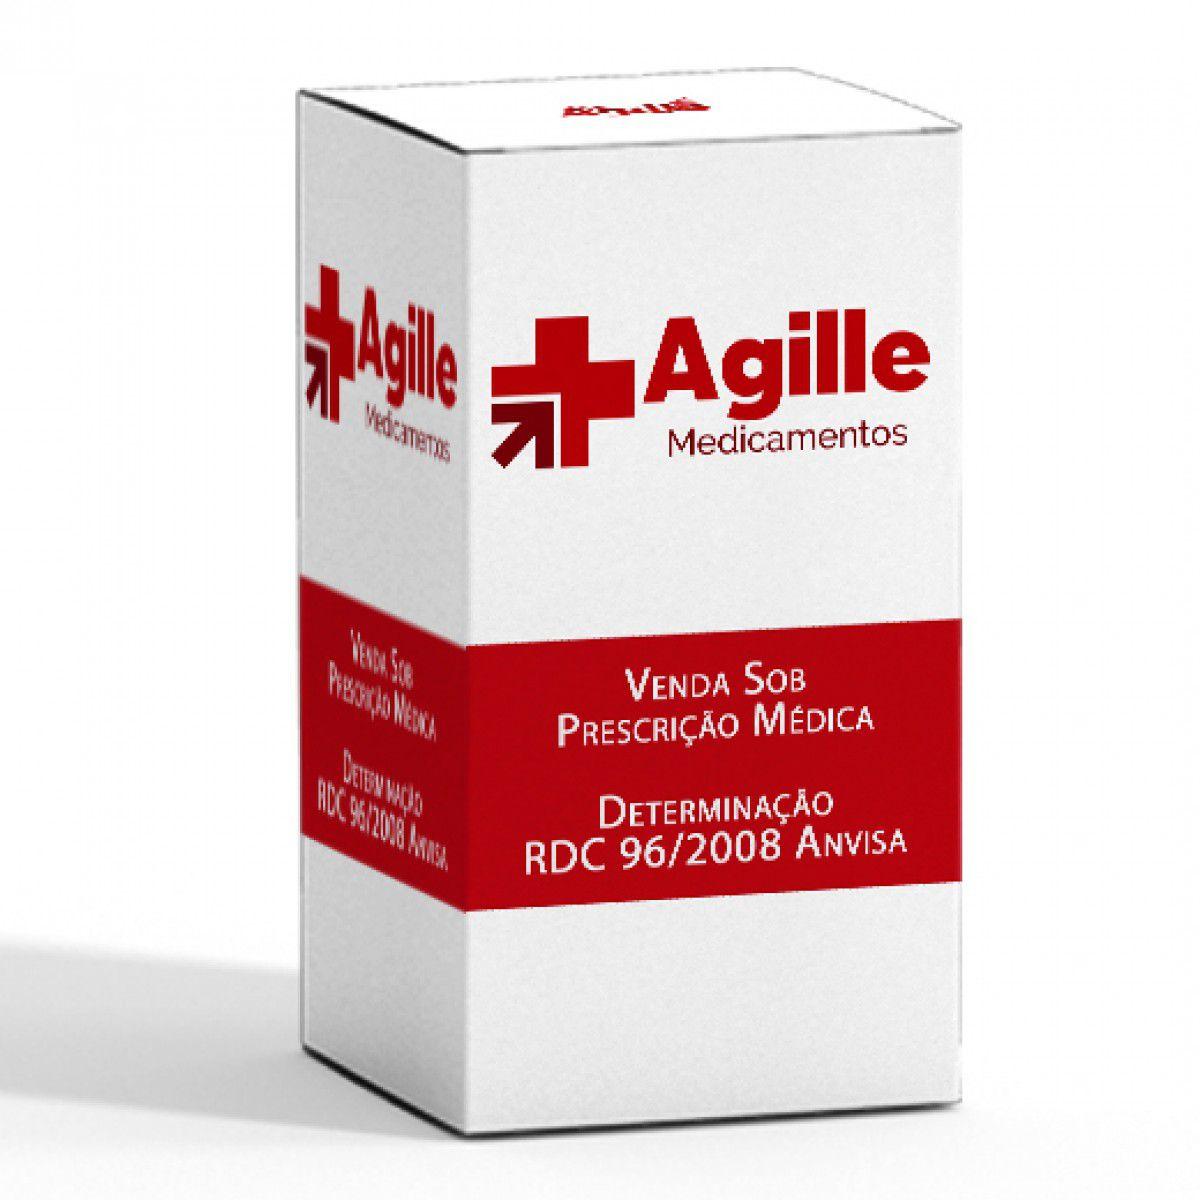 MEKINIST 0.5 MG/DOSE COM REV CT FR PLAS OPC X 30  - Agille Speciality